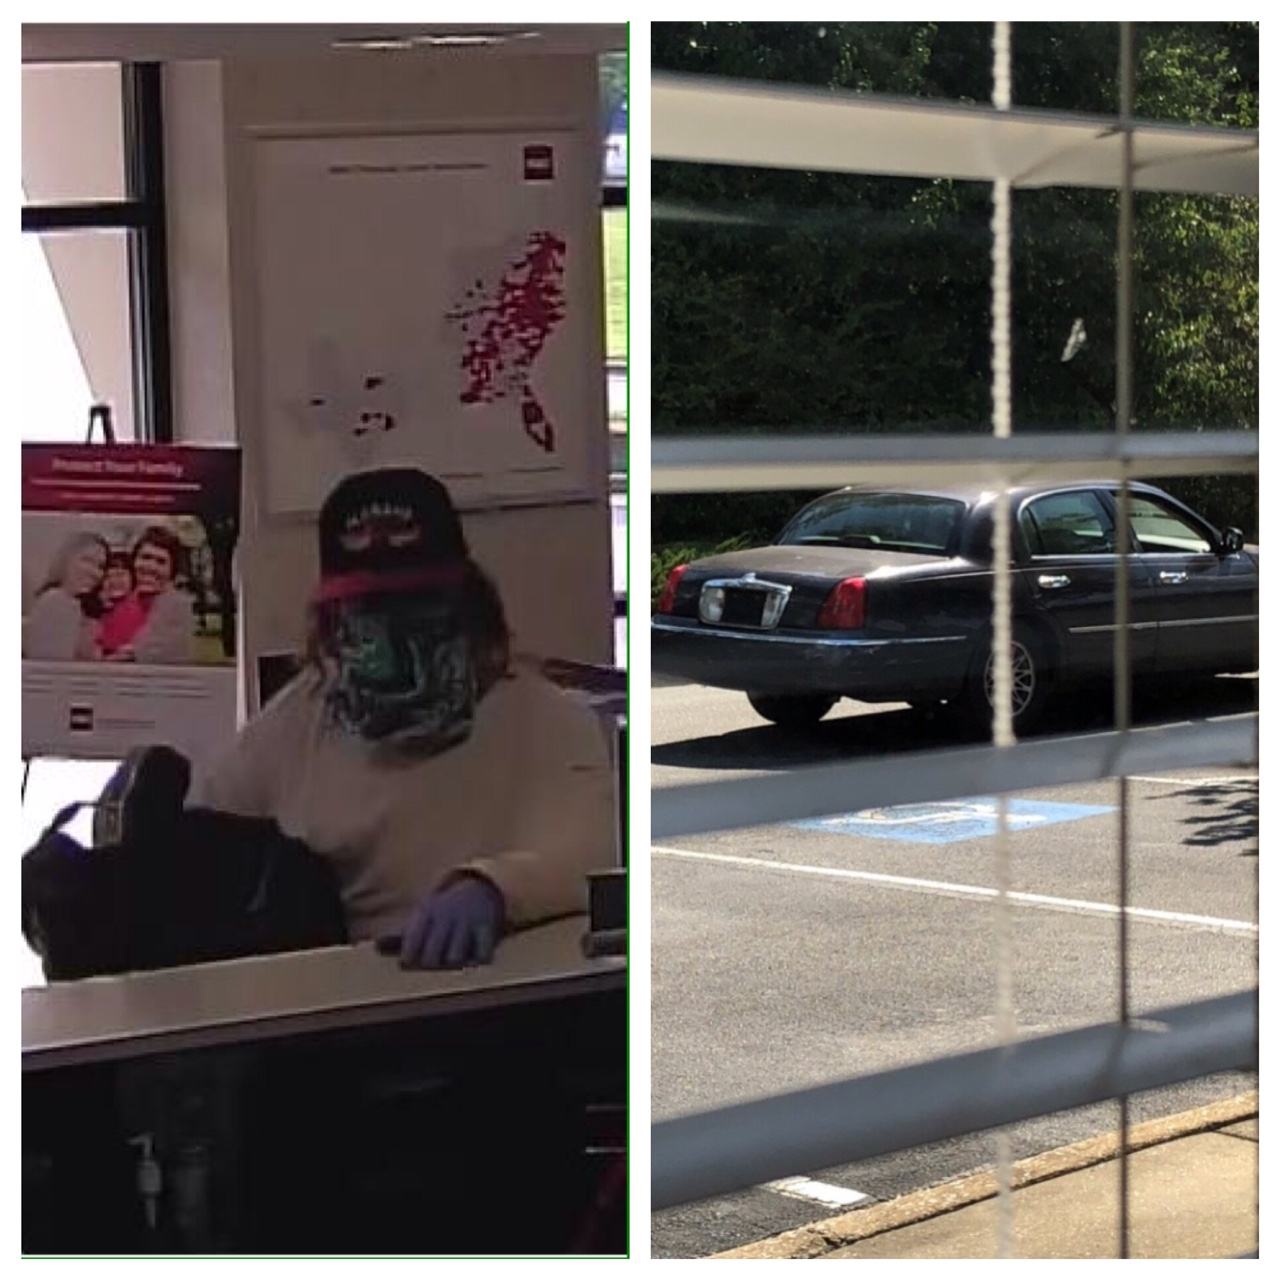 bank robbery suspect_1528470095993.jpg.jpg